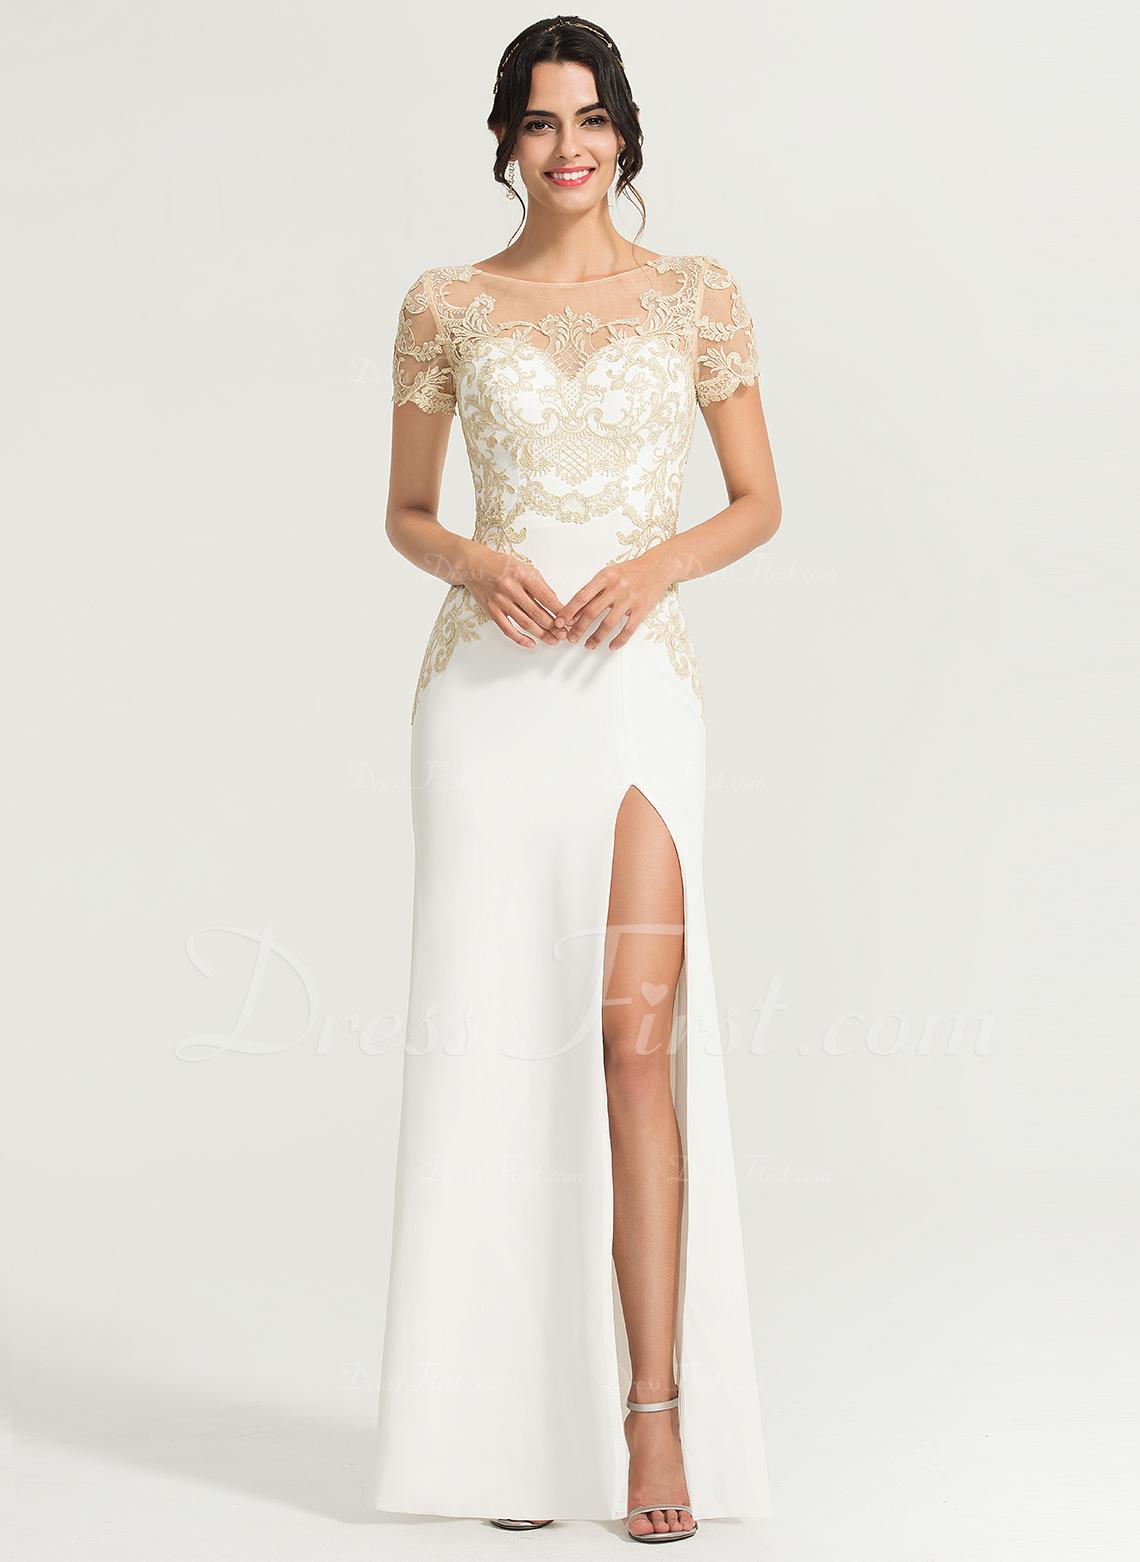 Sheath/Column Scoop Neck Floor-Length Stretch Crepe Evening Dress With Split Front